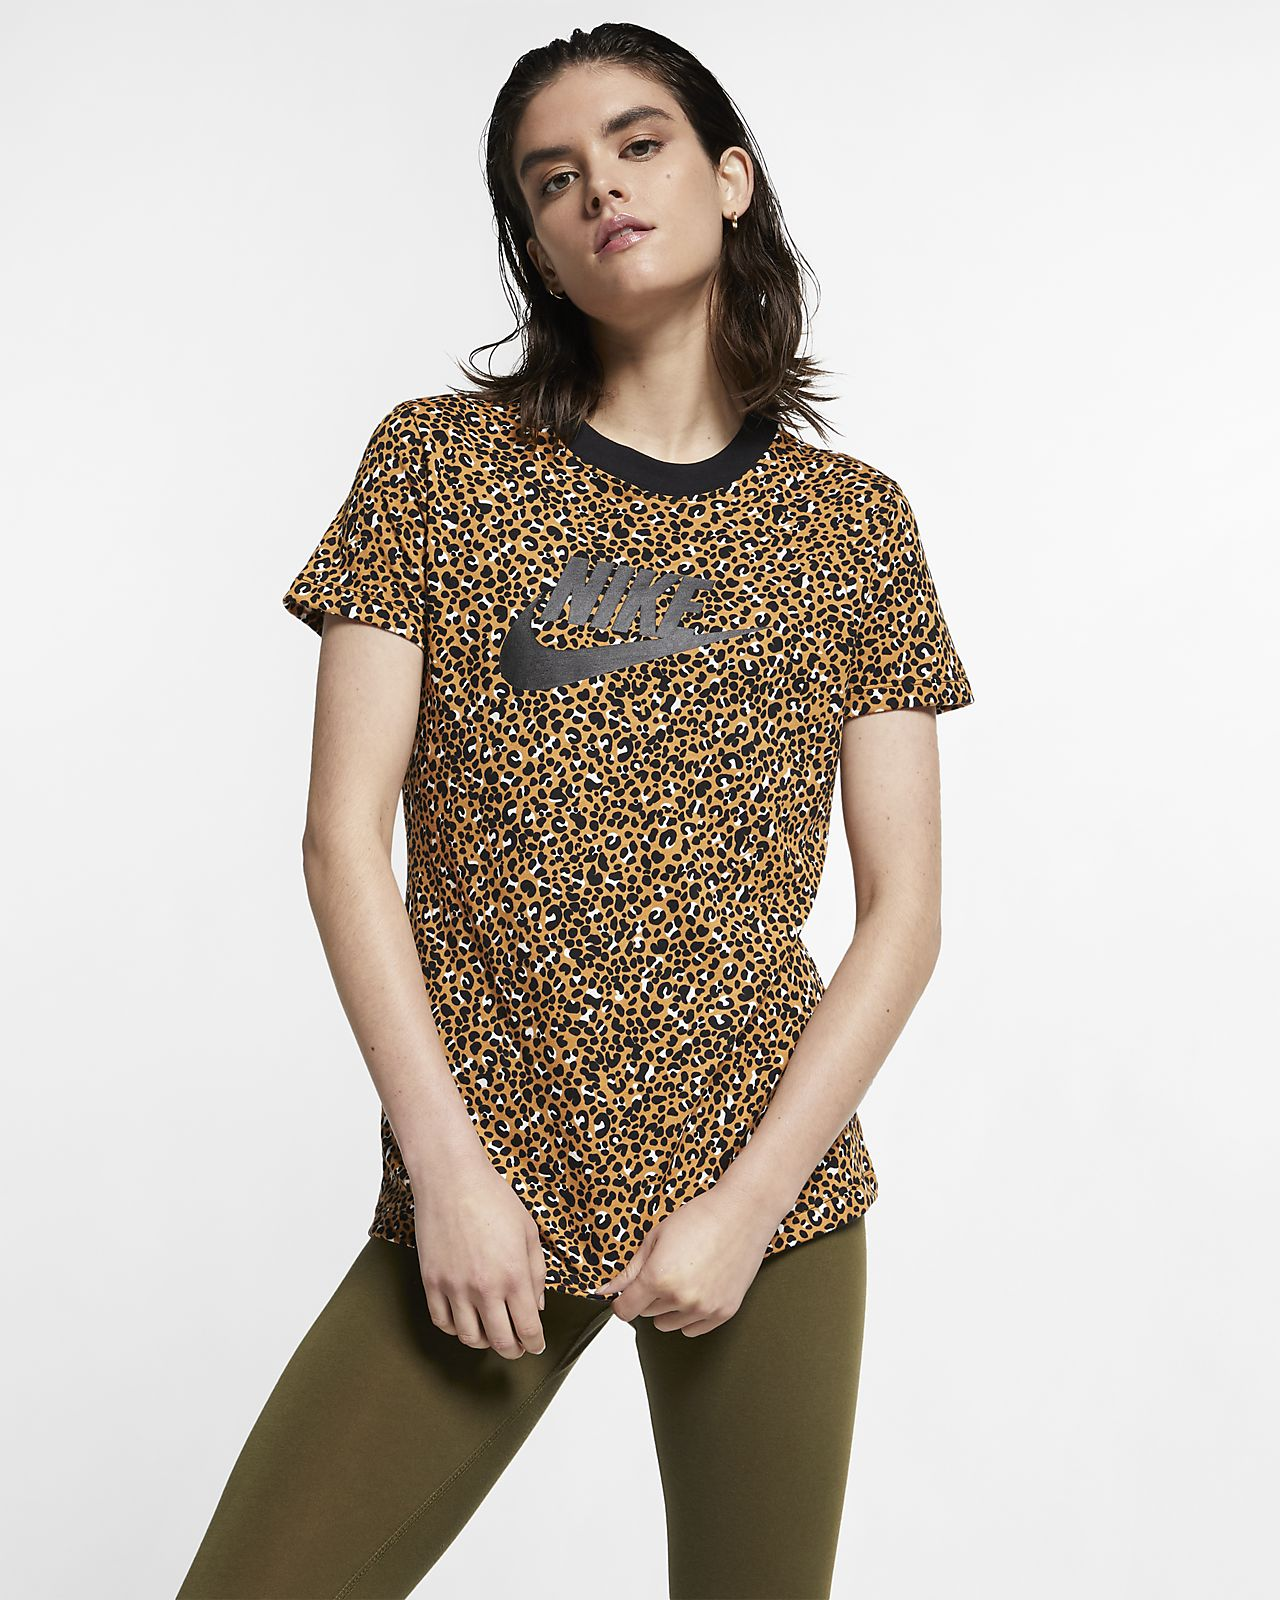 Женская футболка Nike Sportswear Animal Print